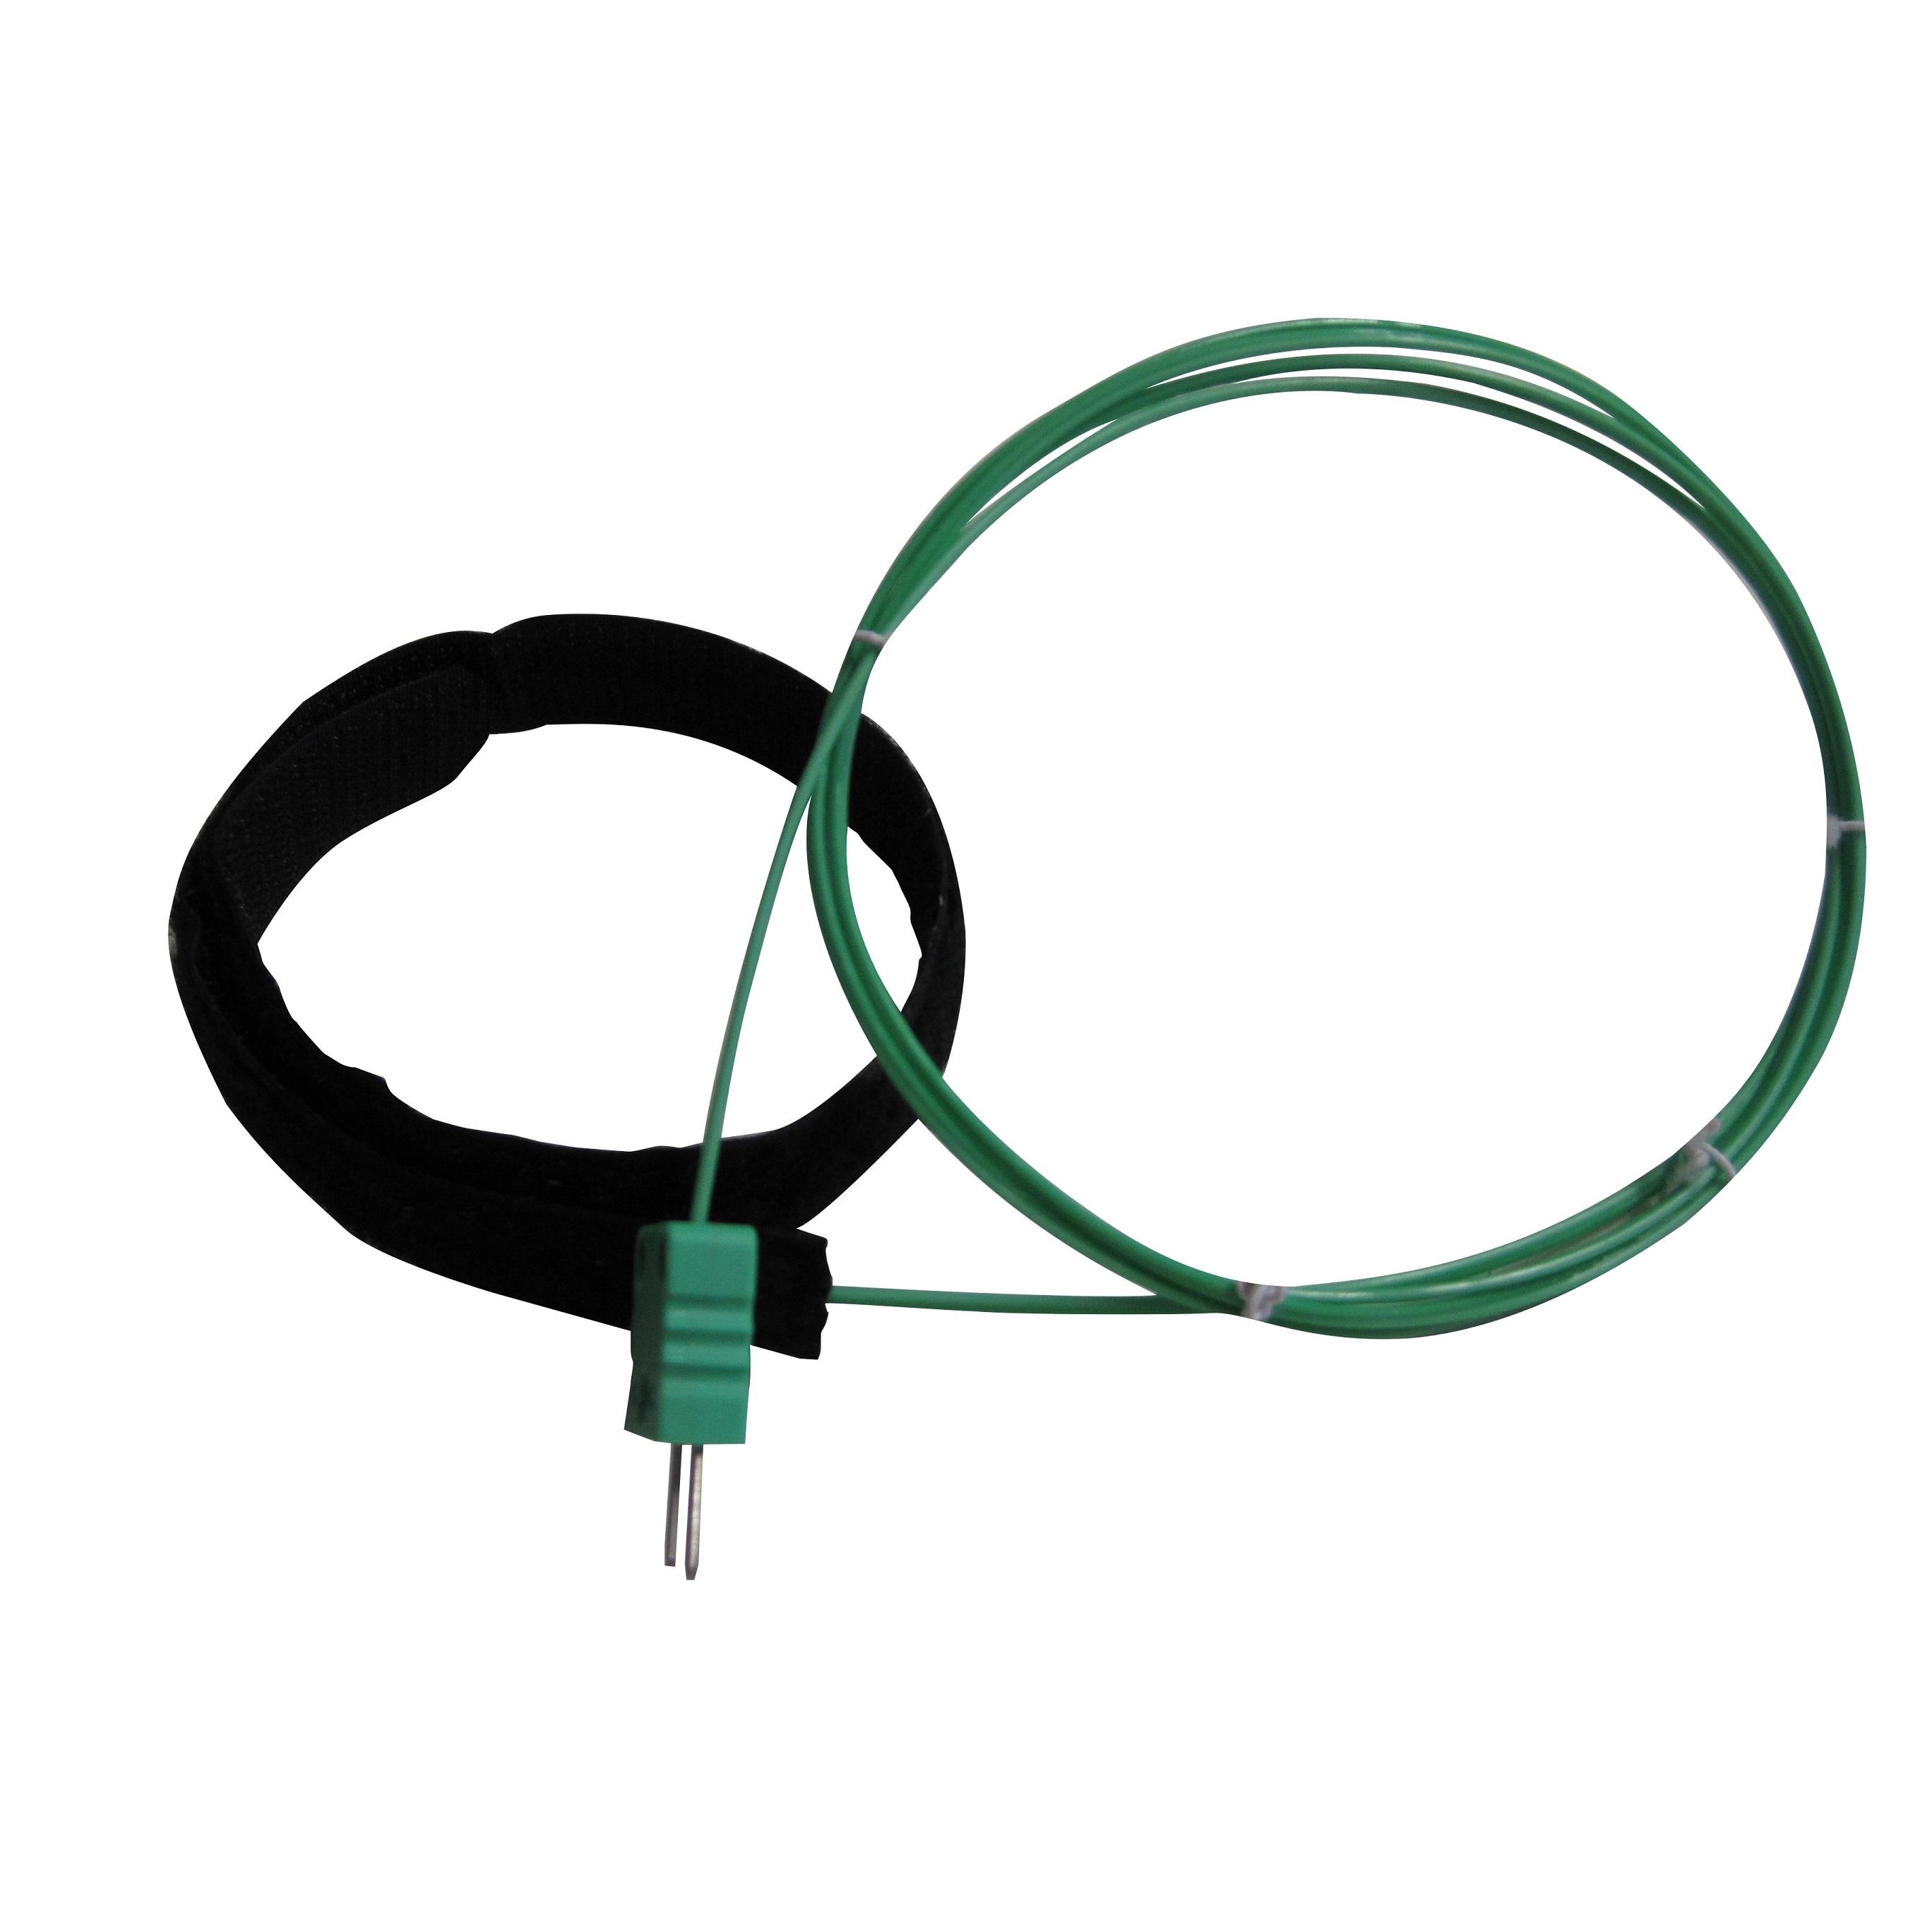 Thermocouple K de surface pour tuyauterie montage radial